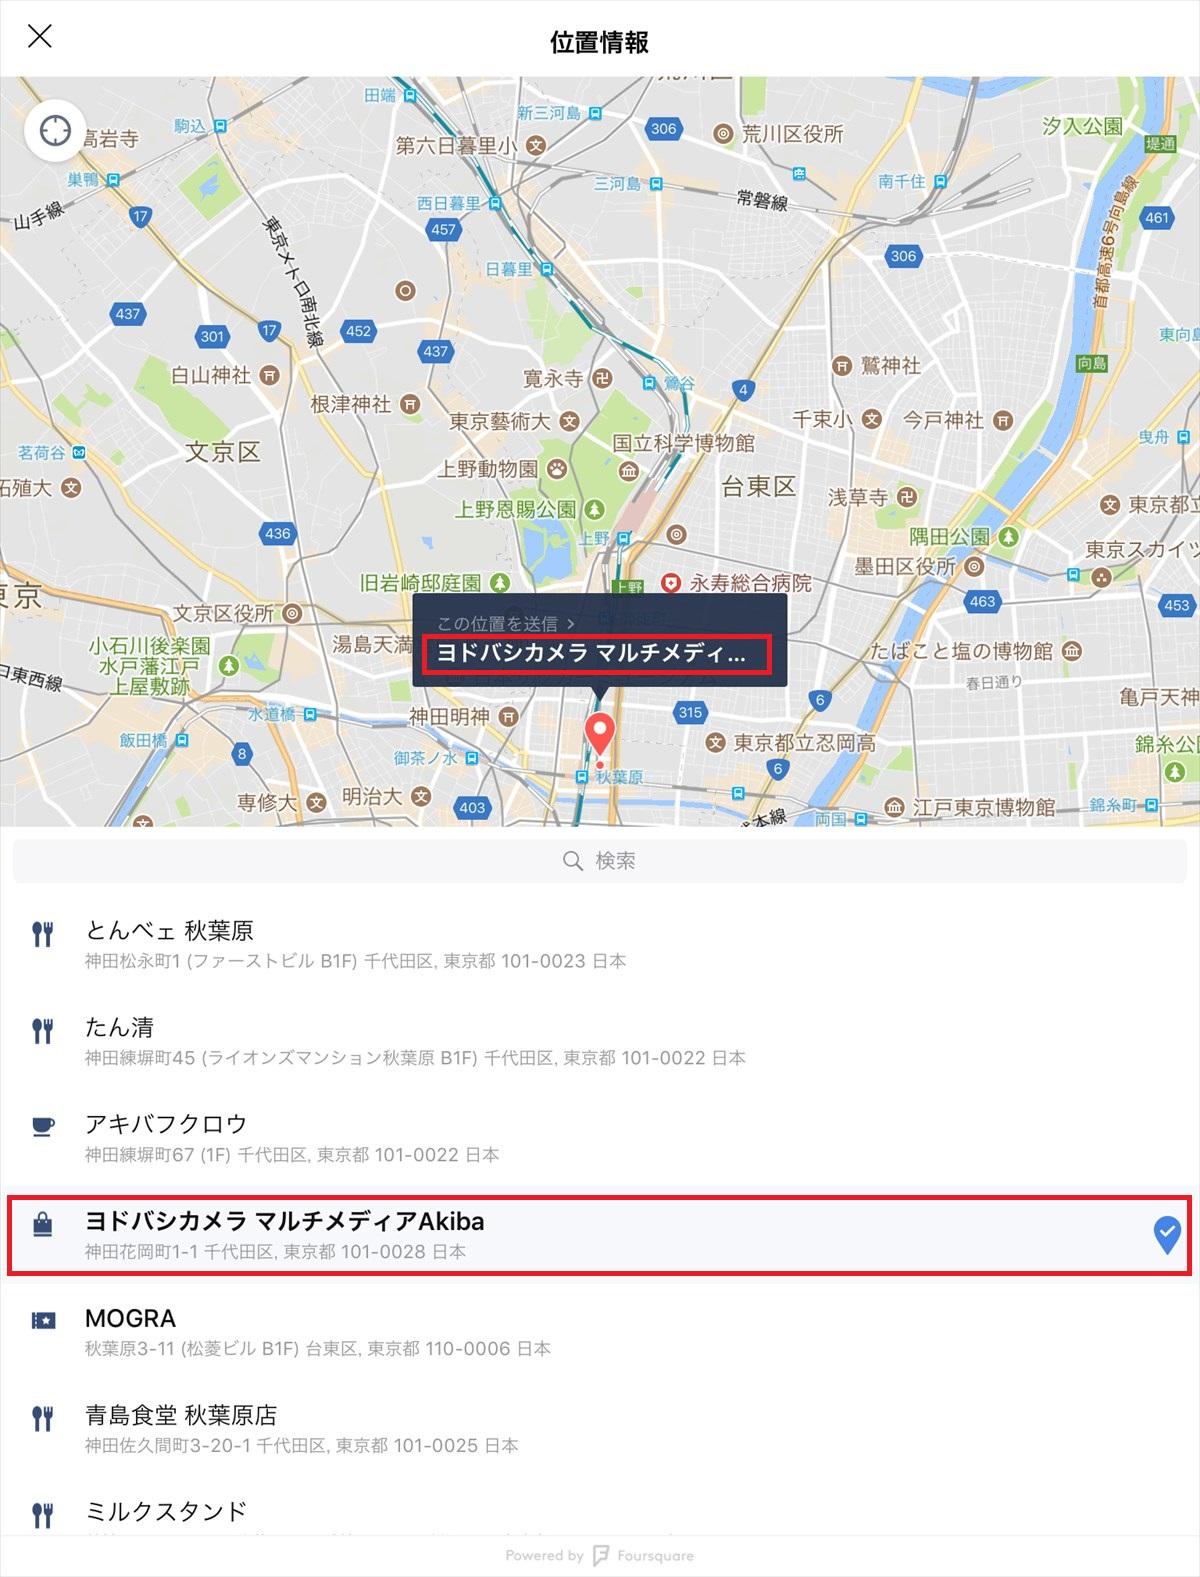 LINE_位置情報_送信6_iOS